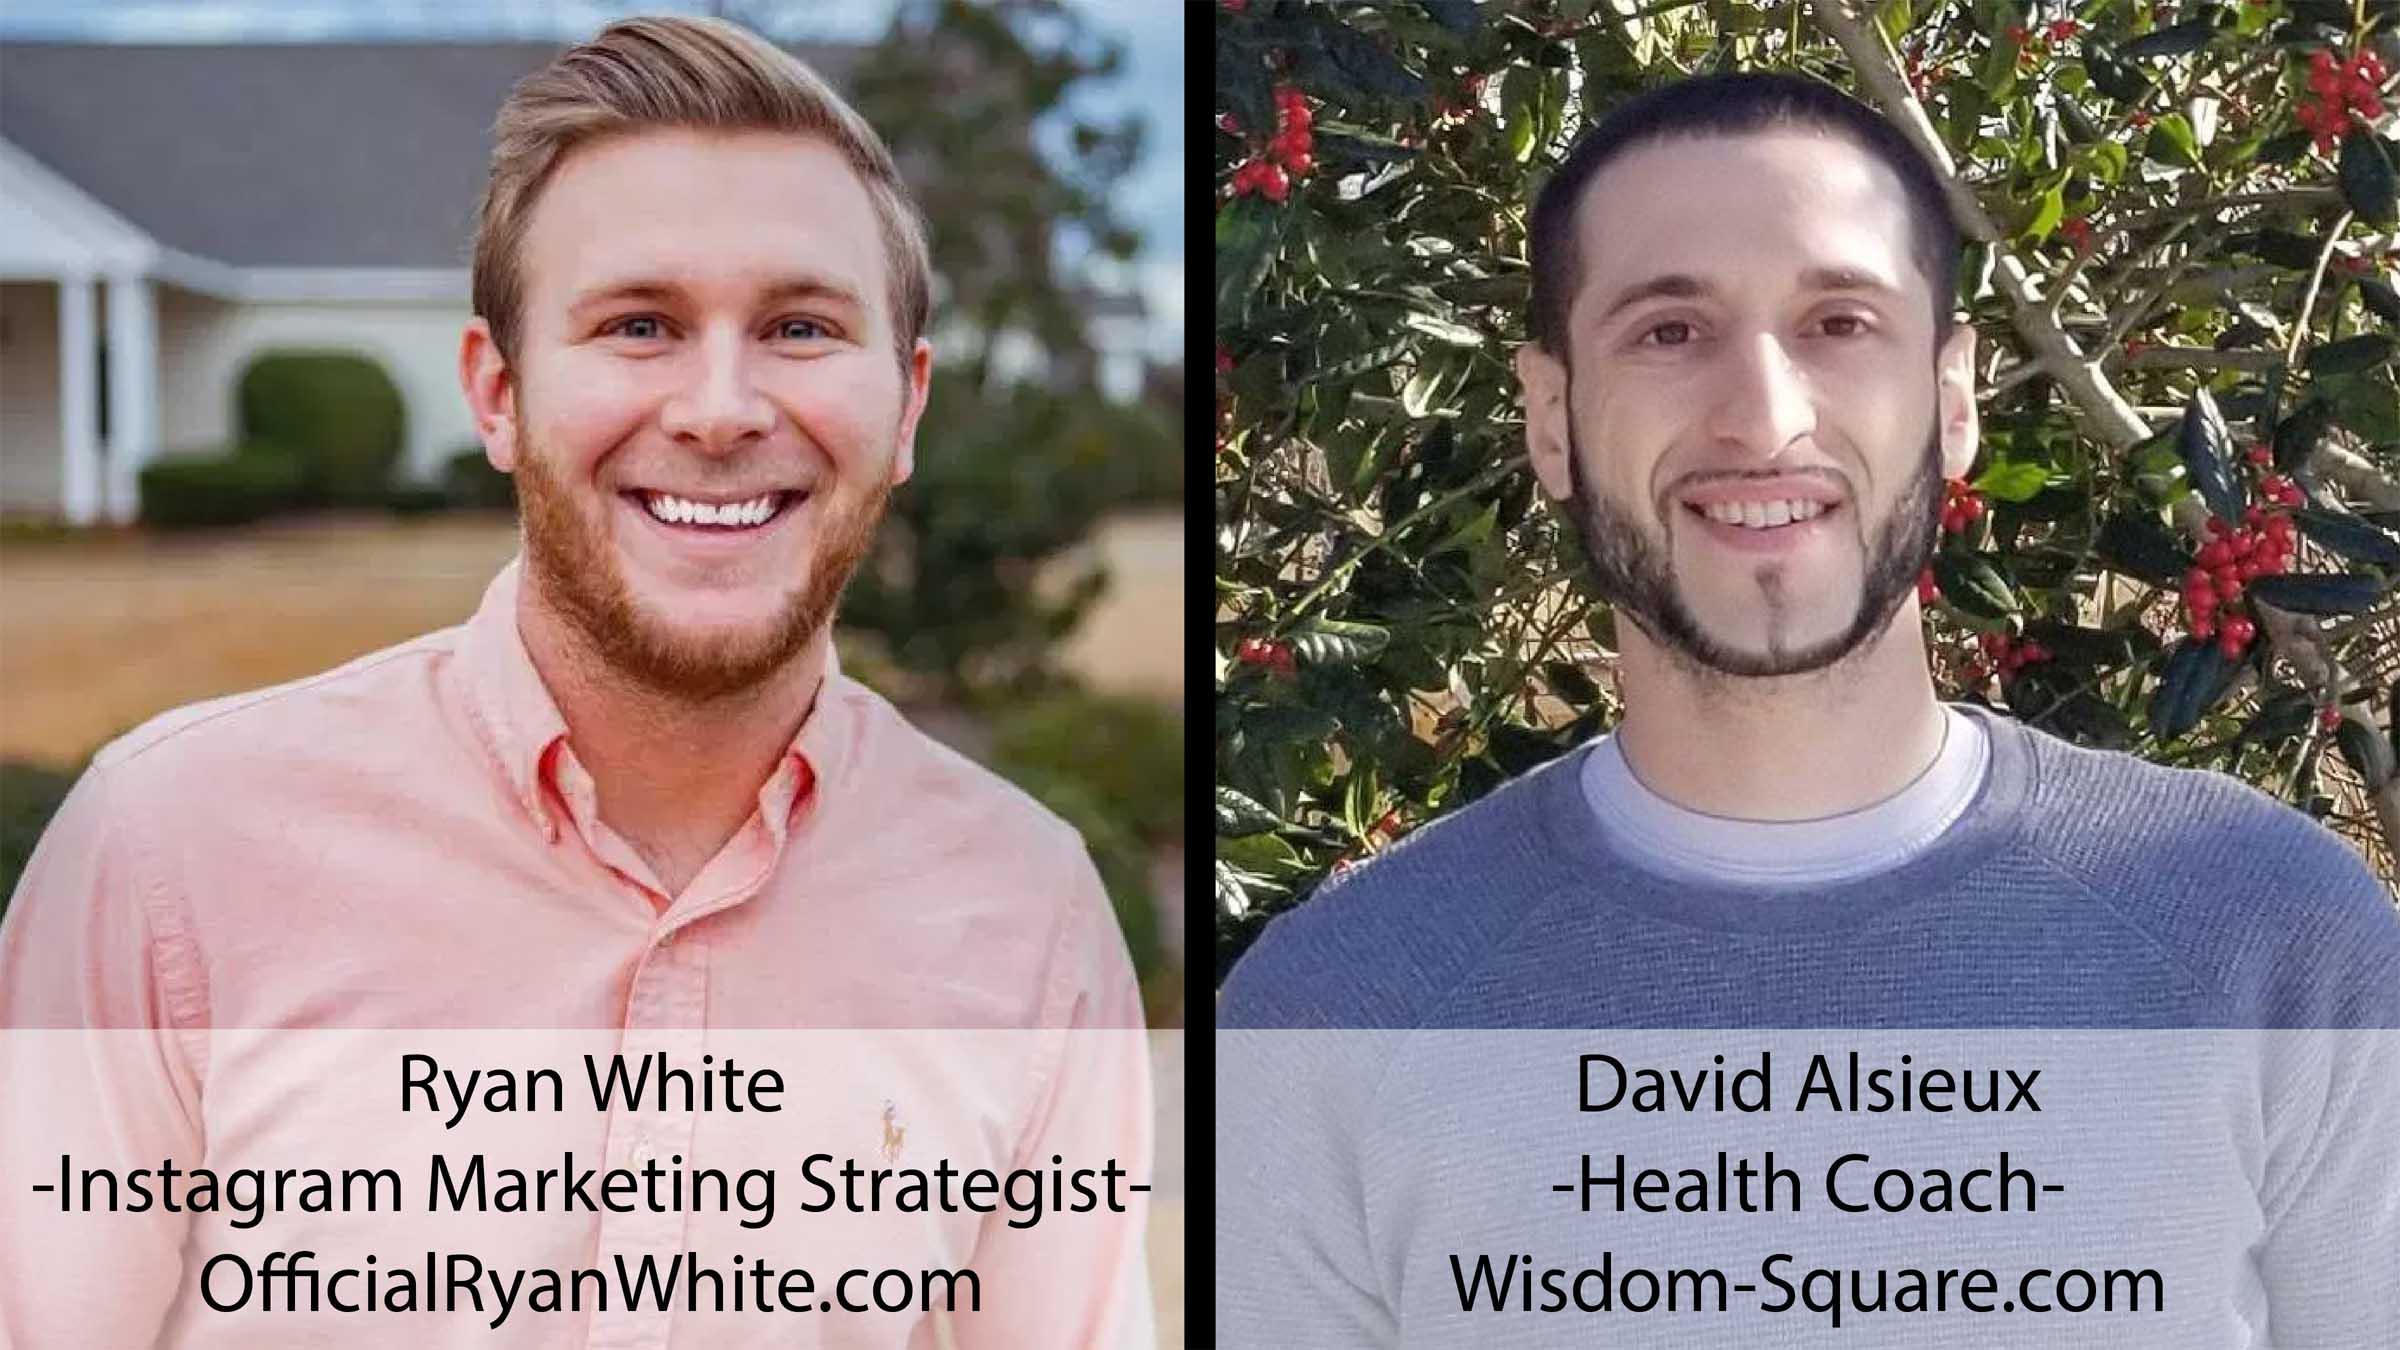 Ask Me About Health - Episode 1 - with Entrepreneur Ryan White from Atlanta, GA